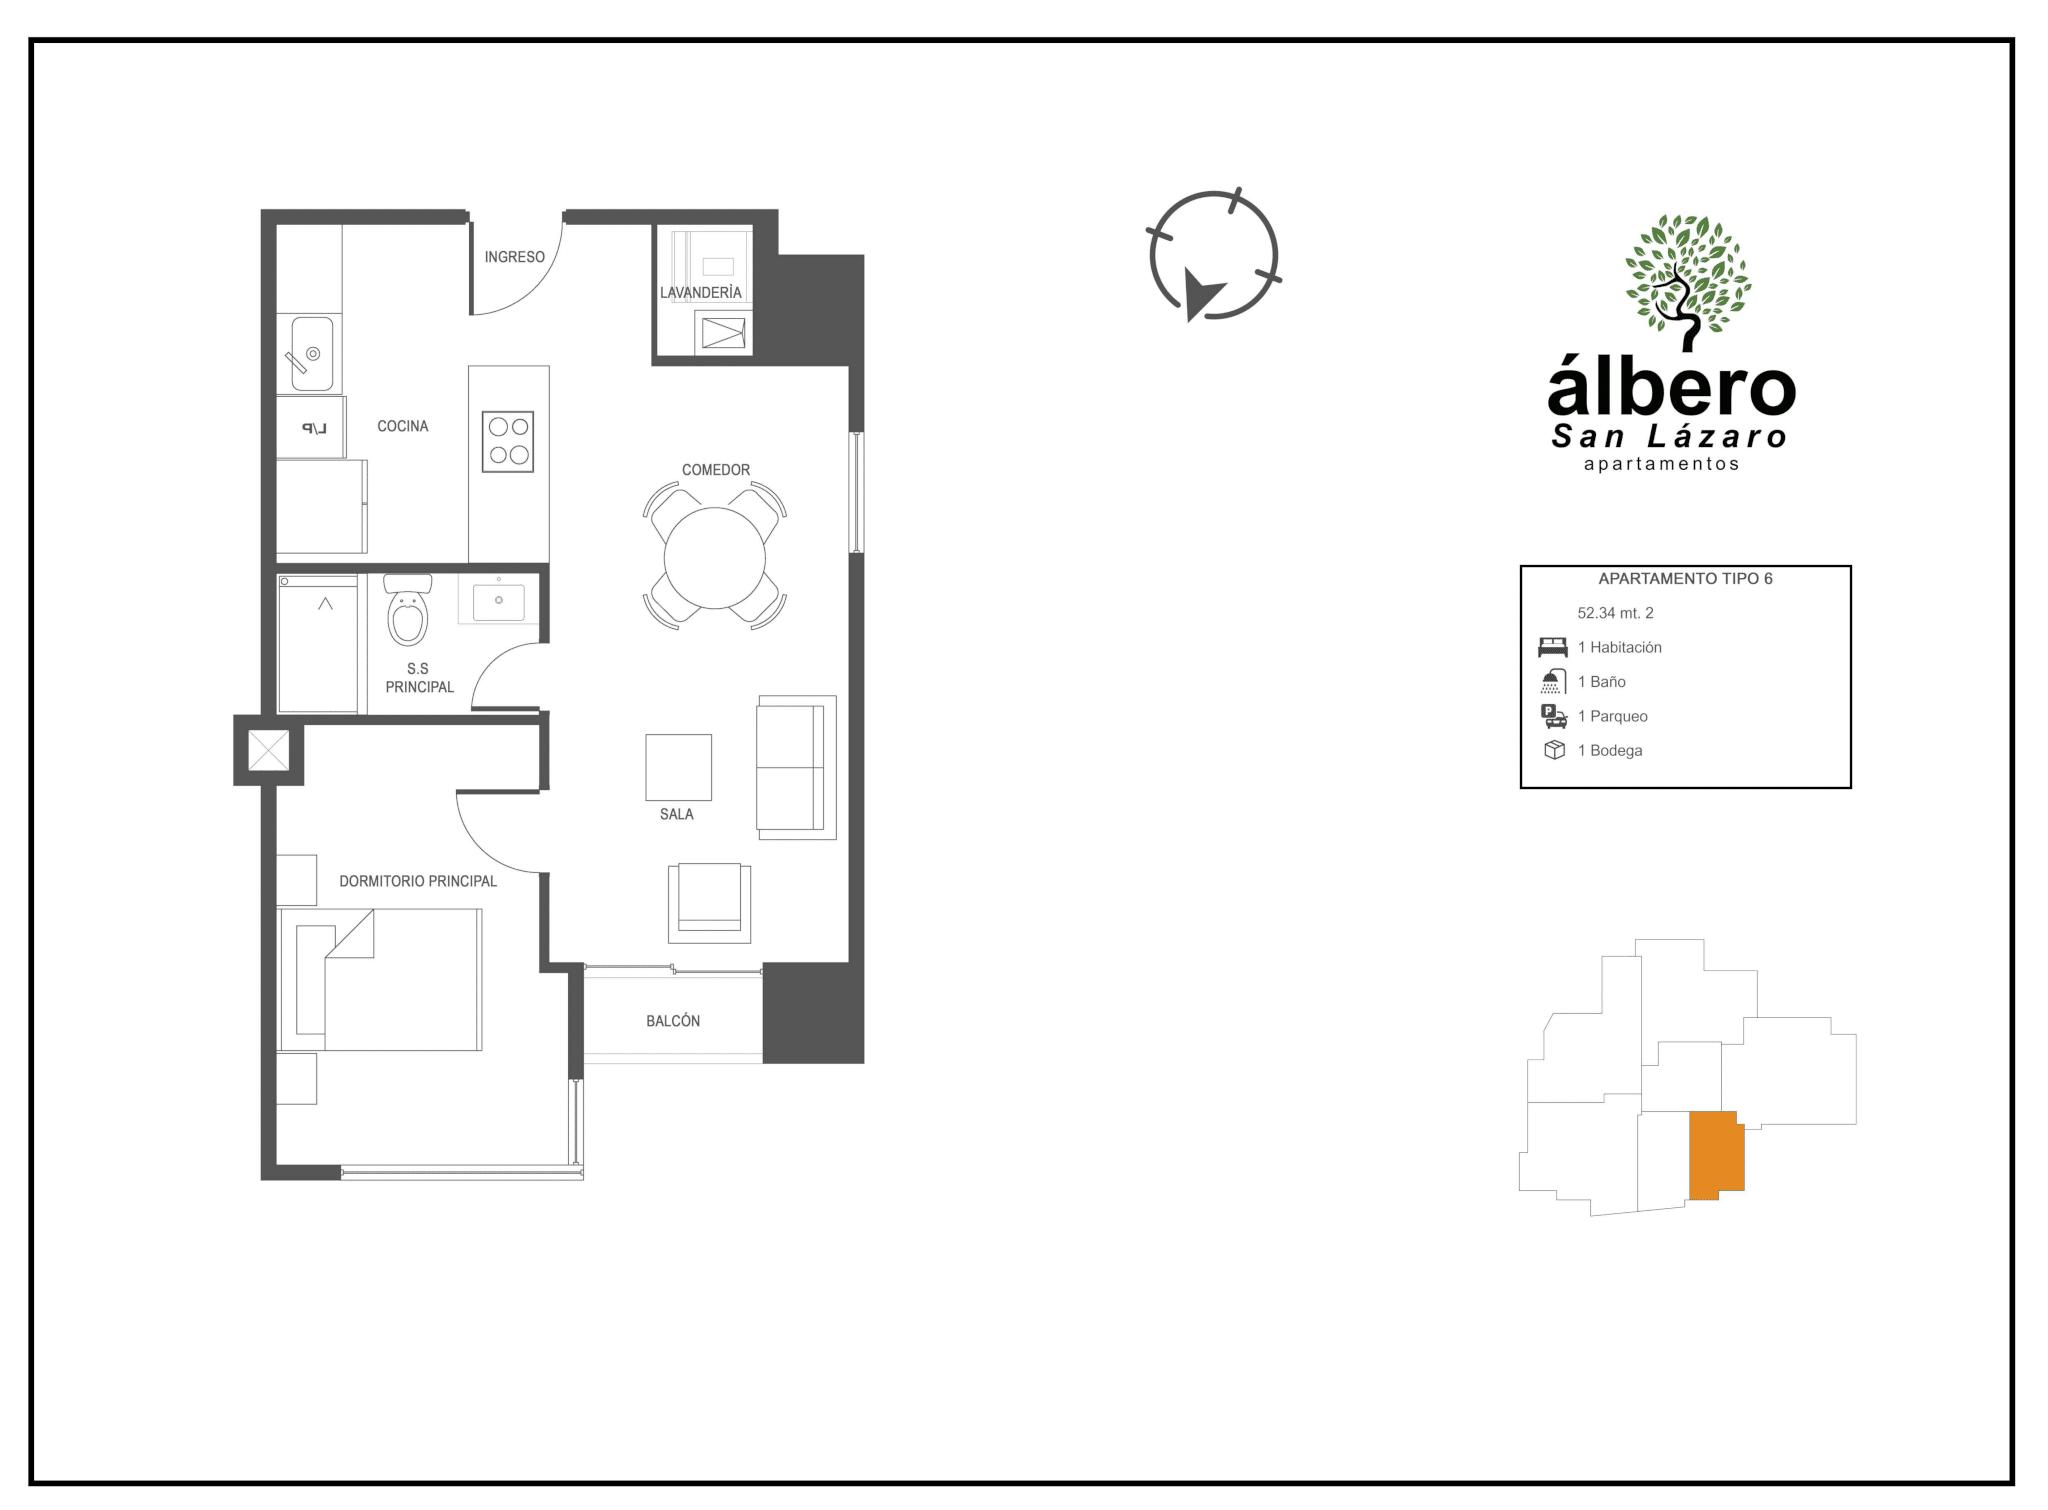 apartamento tipo 6